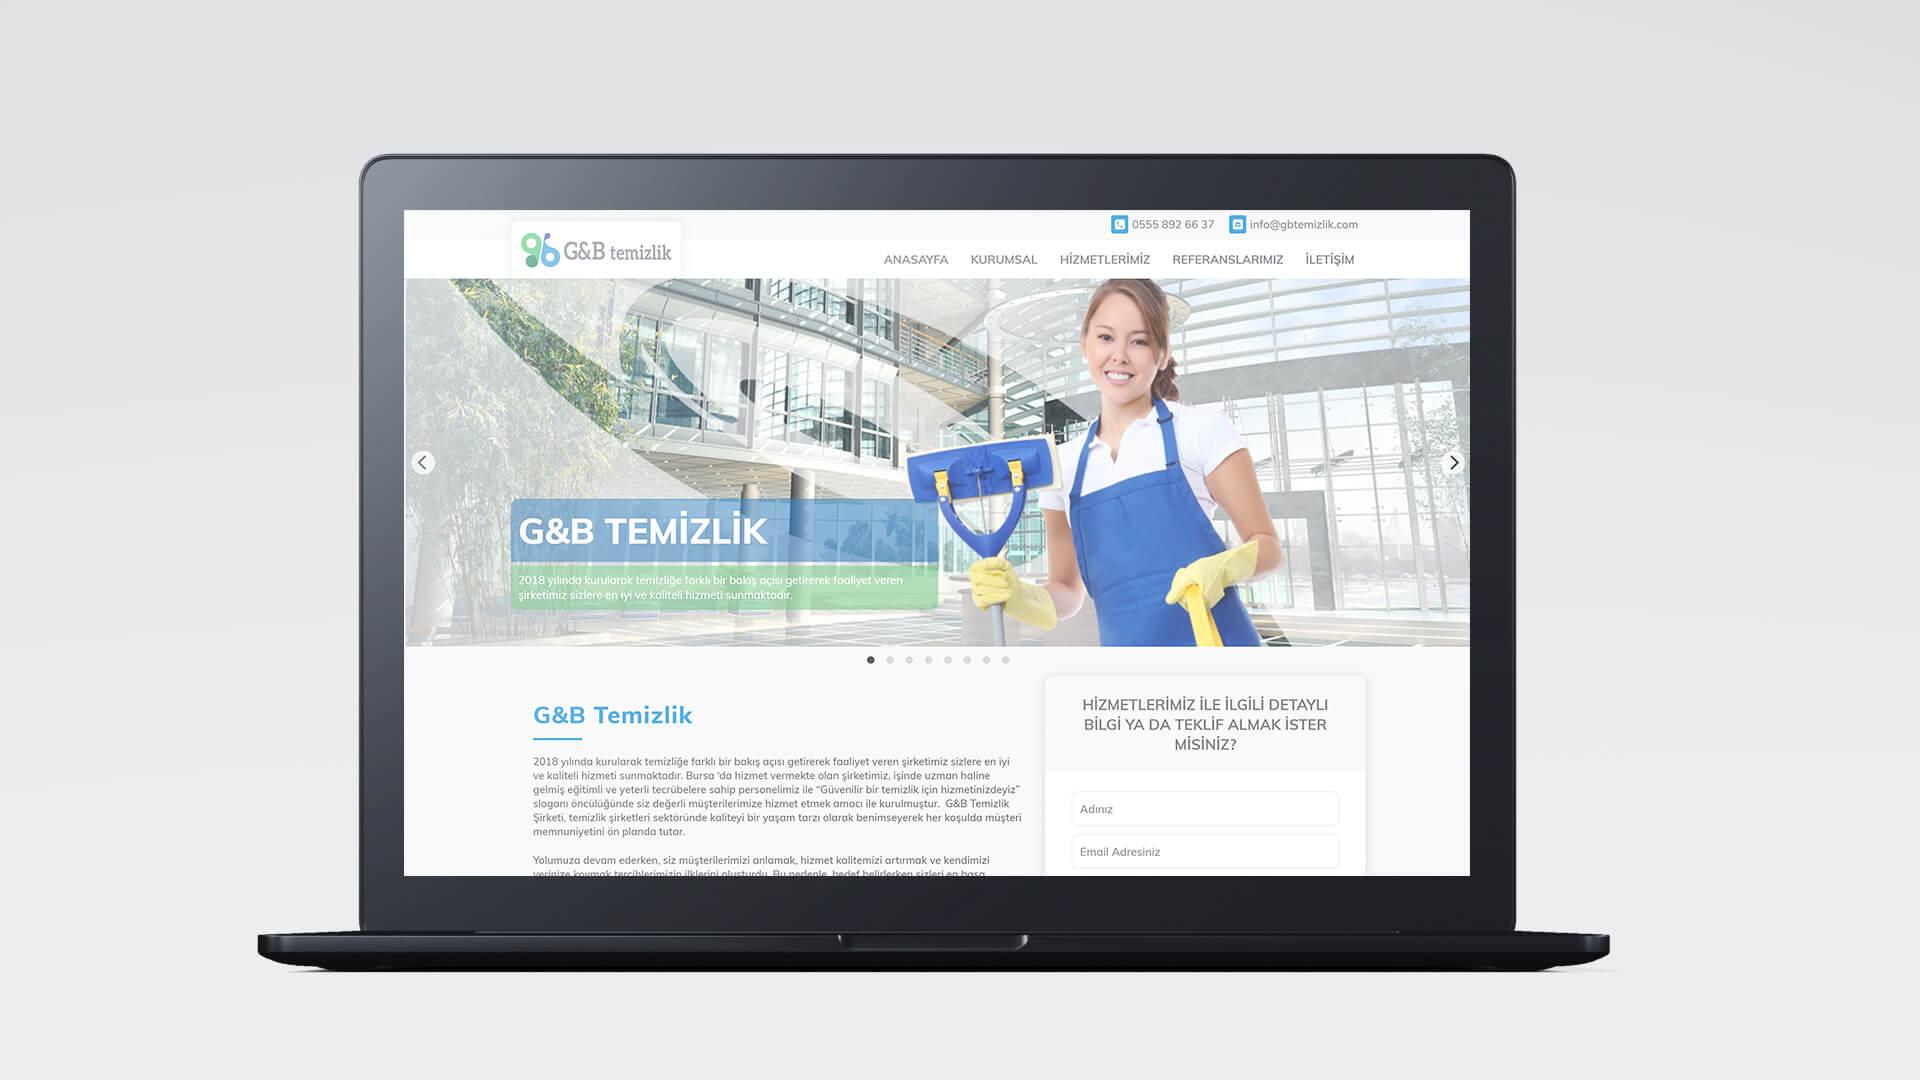 gb-temizlik-laptop